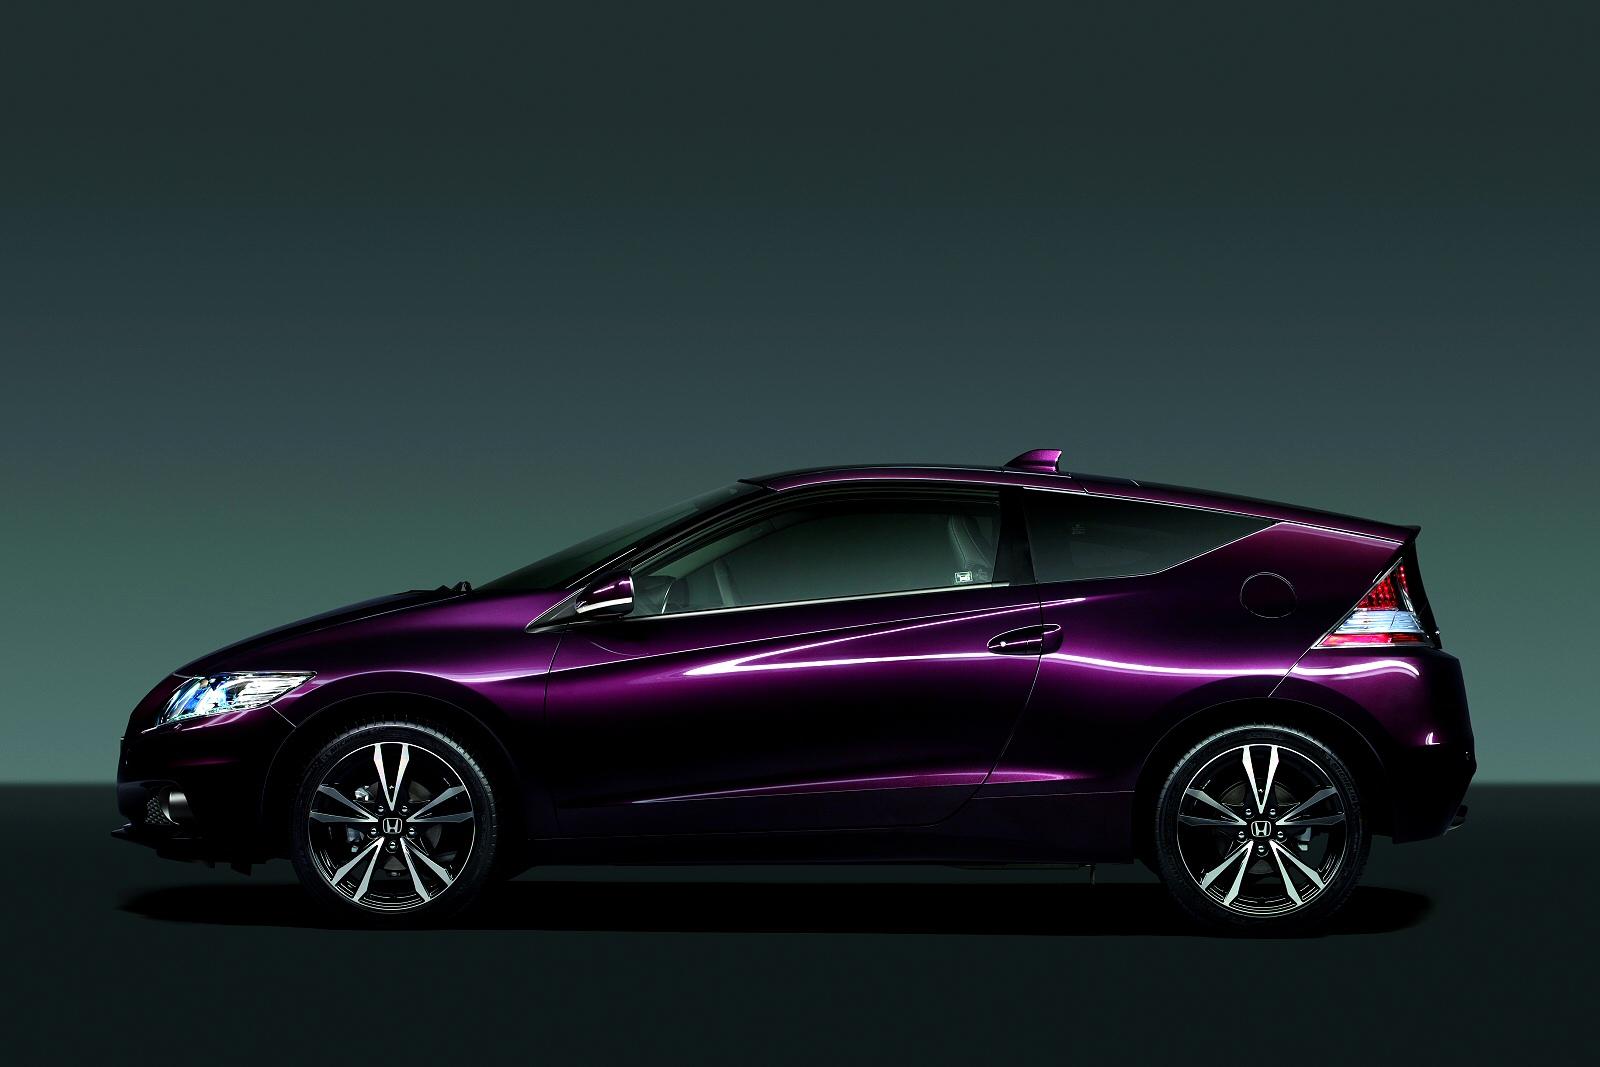 Charging Less Honda Cr Z 2013 2014 Range Independent Used